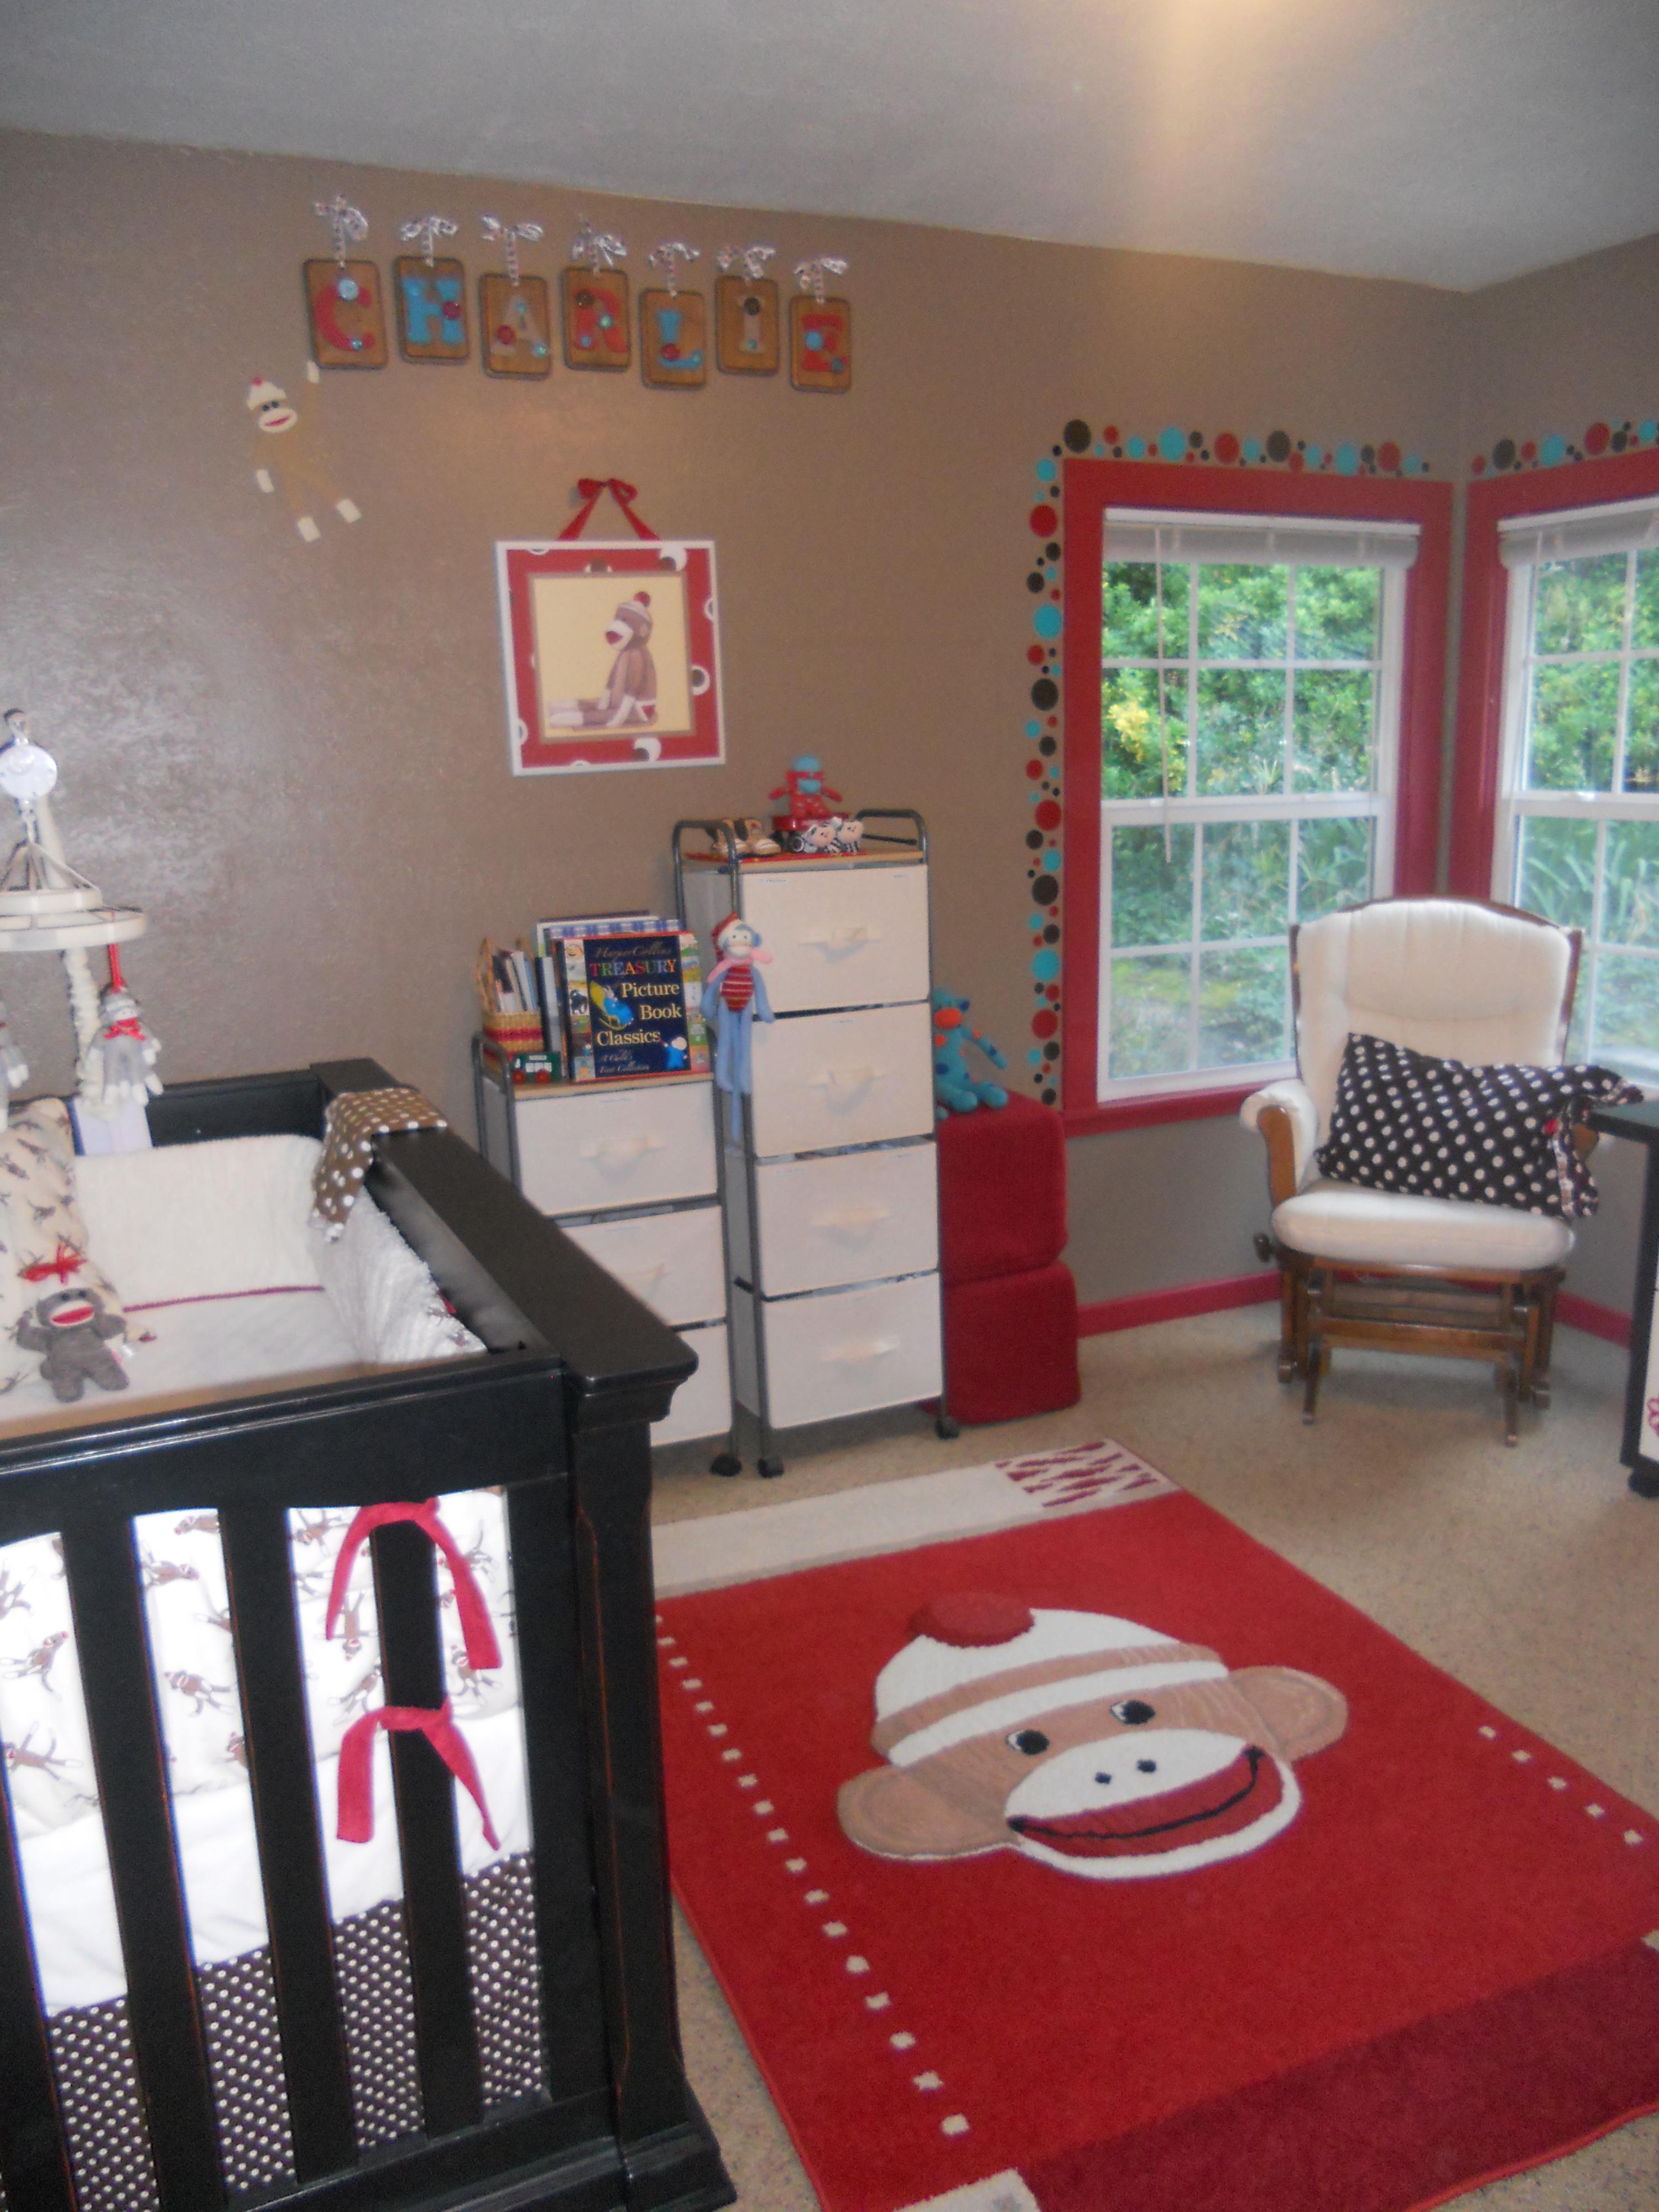 Kids Line Mod Pod Pop Monkey Rug Duck Egg Incubator Sock Nursery For Charlie Project